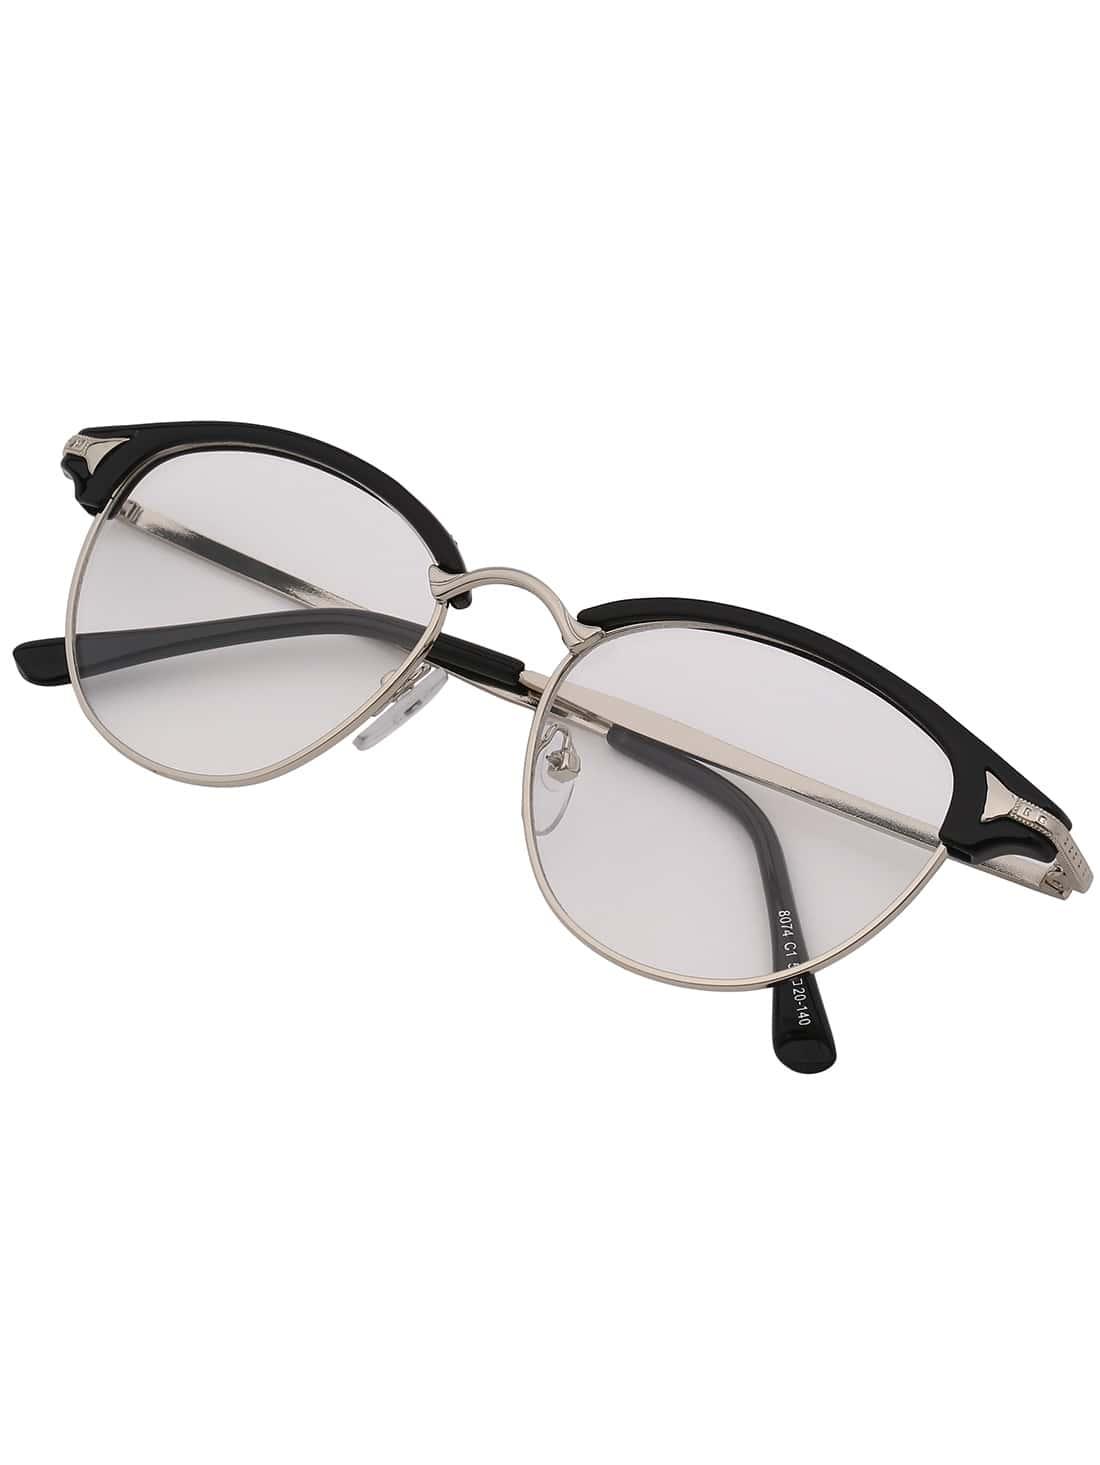 Black Half Frame Glasses : Black Half Frame Plastic Rimmed Sunglasses -SheIn(Sheinside)